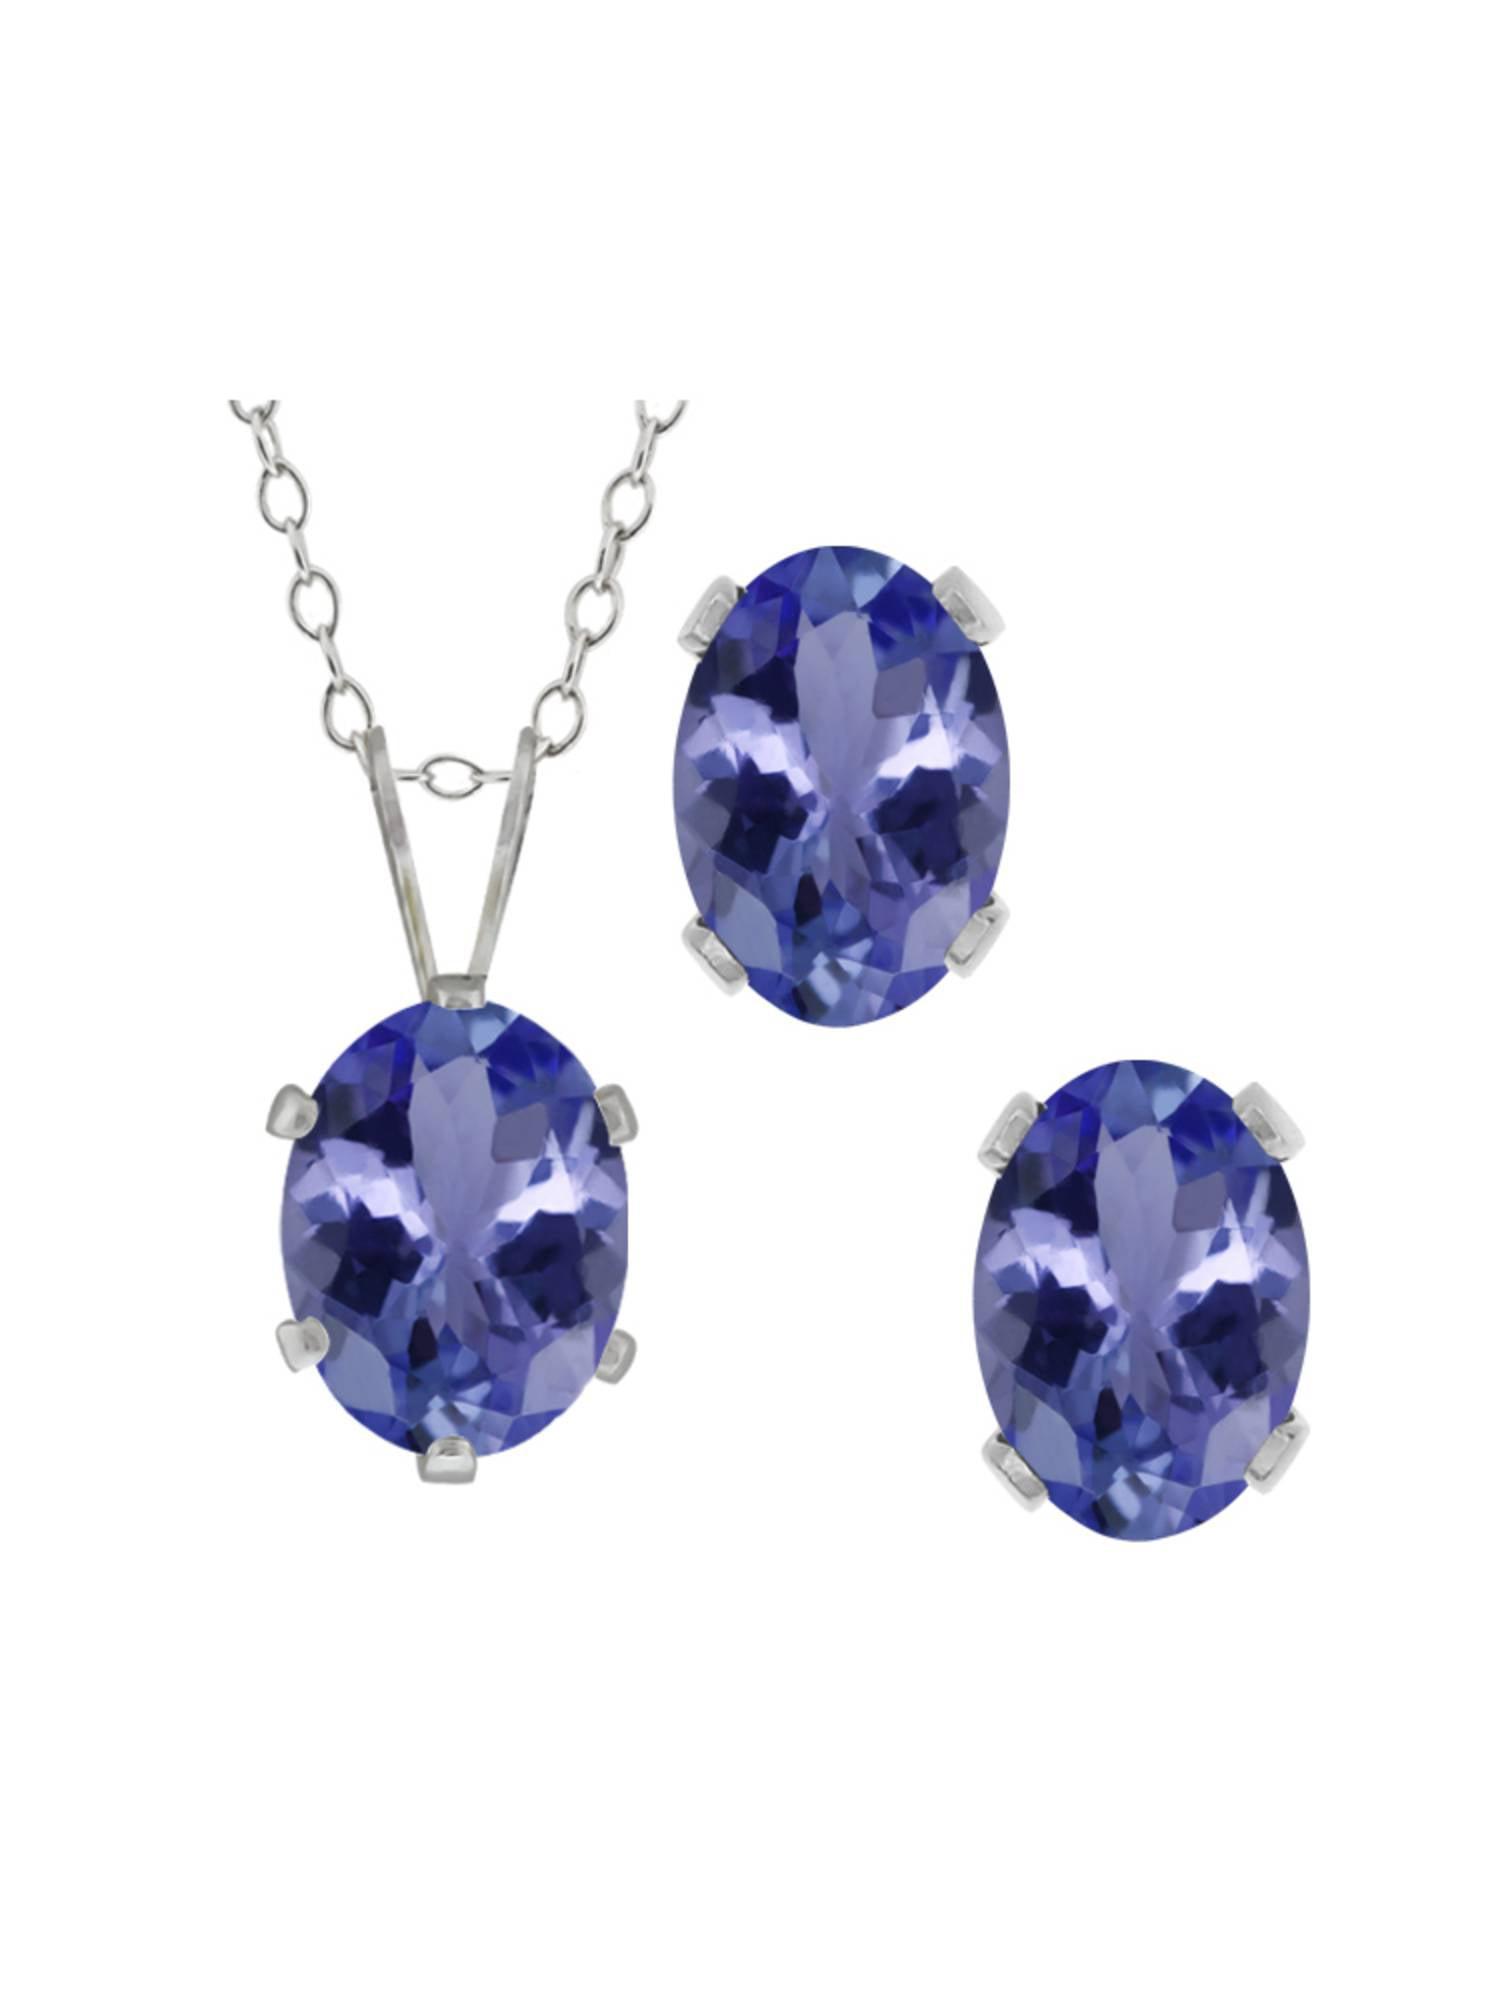 2.66 Ct Oval Blue Tanzanite Gemstone Sterling Silver Pendant Earrings Set by